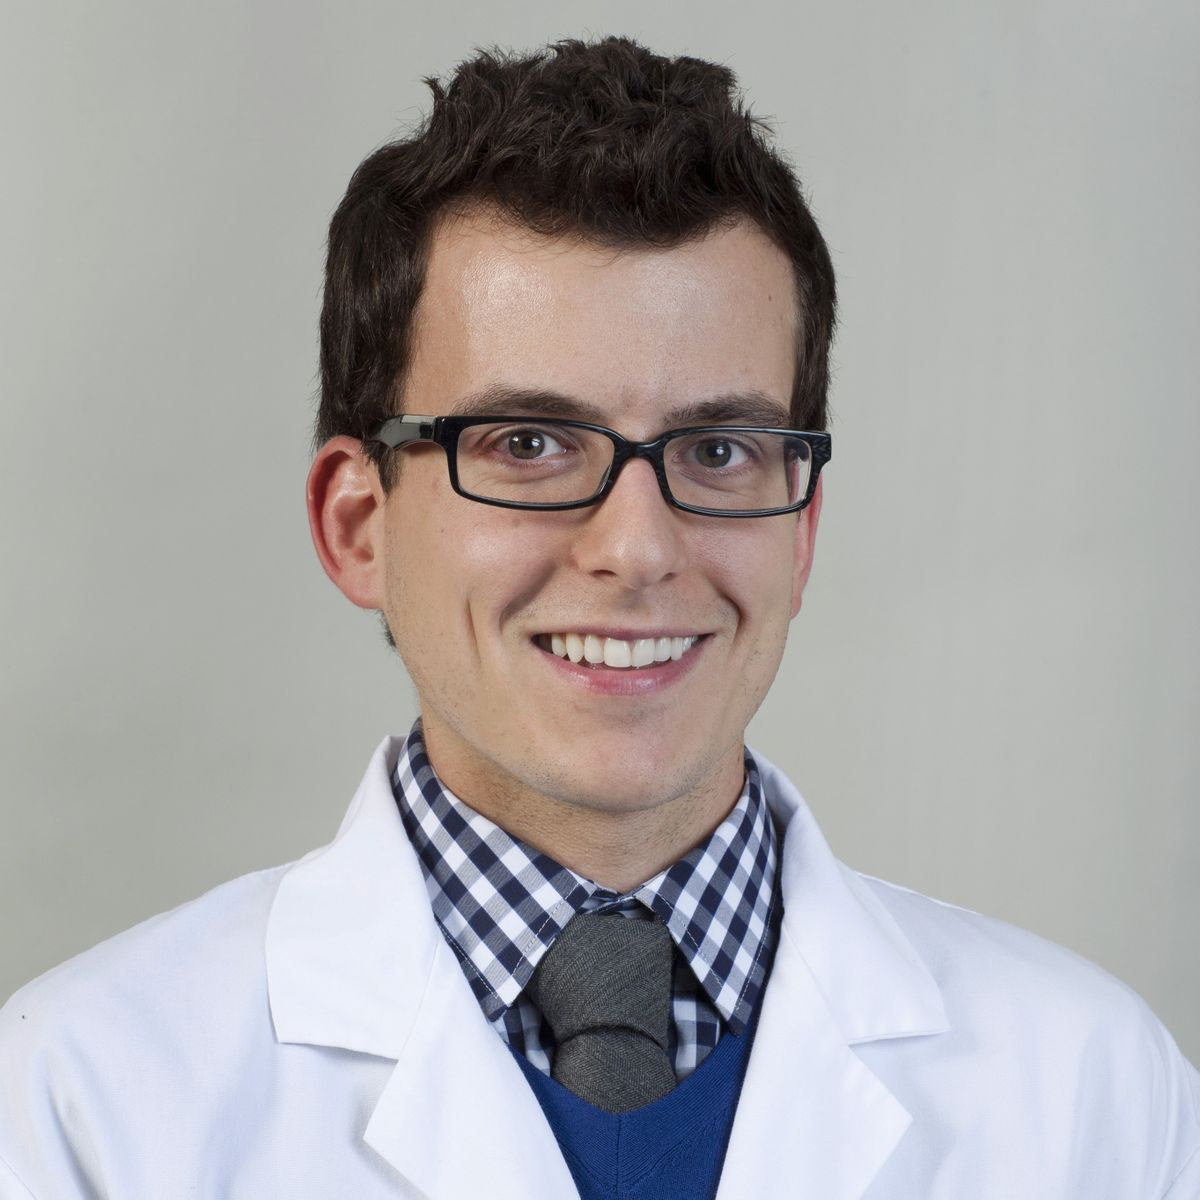 Dr. Aaron Laviana